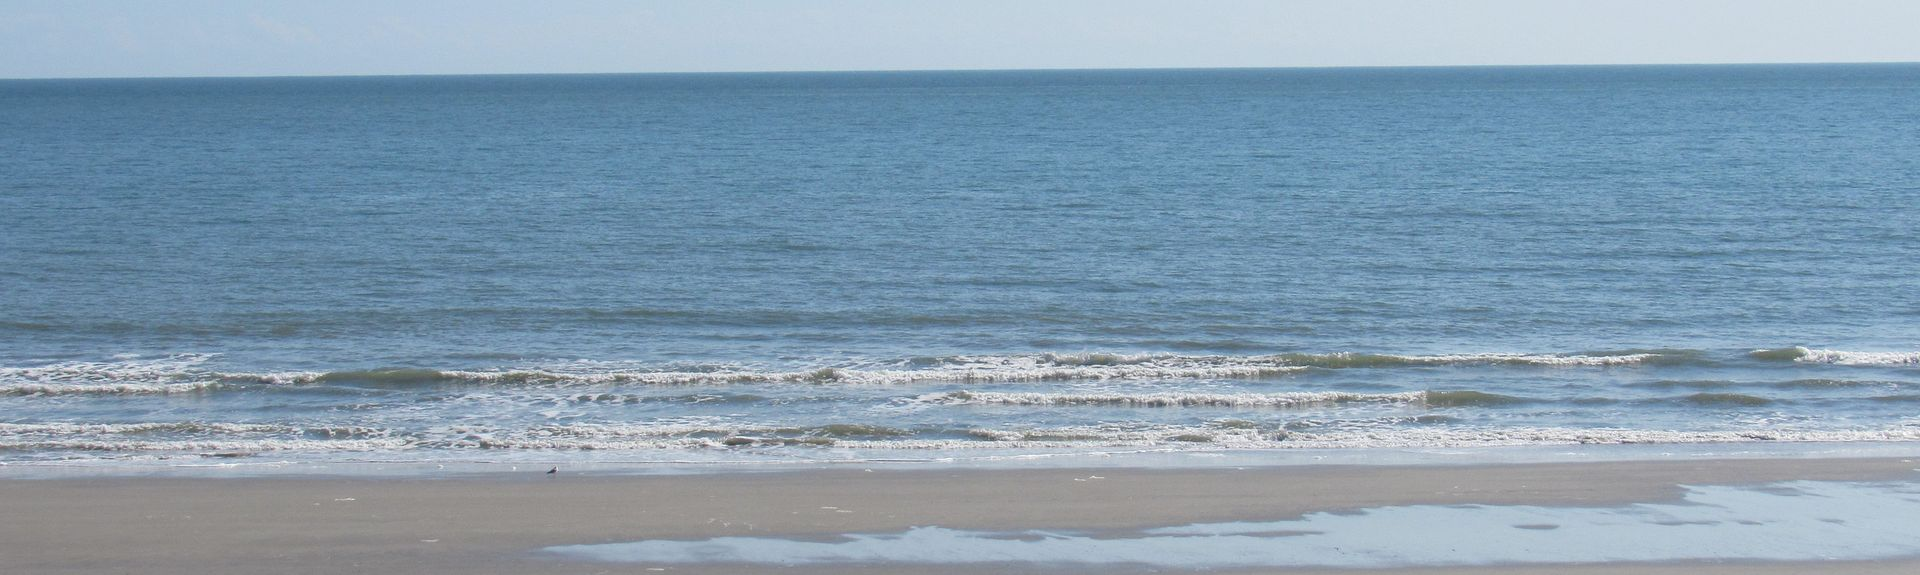 Sea Winds (North Myrtle Beach, South Carolina, Verenigde Staten)